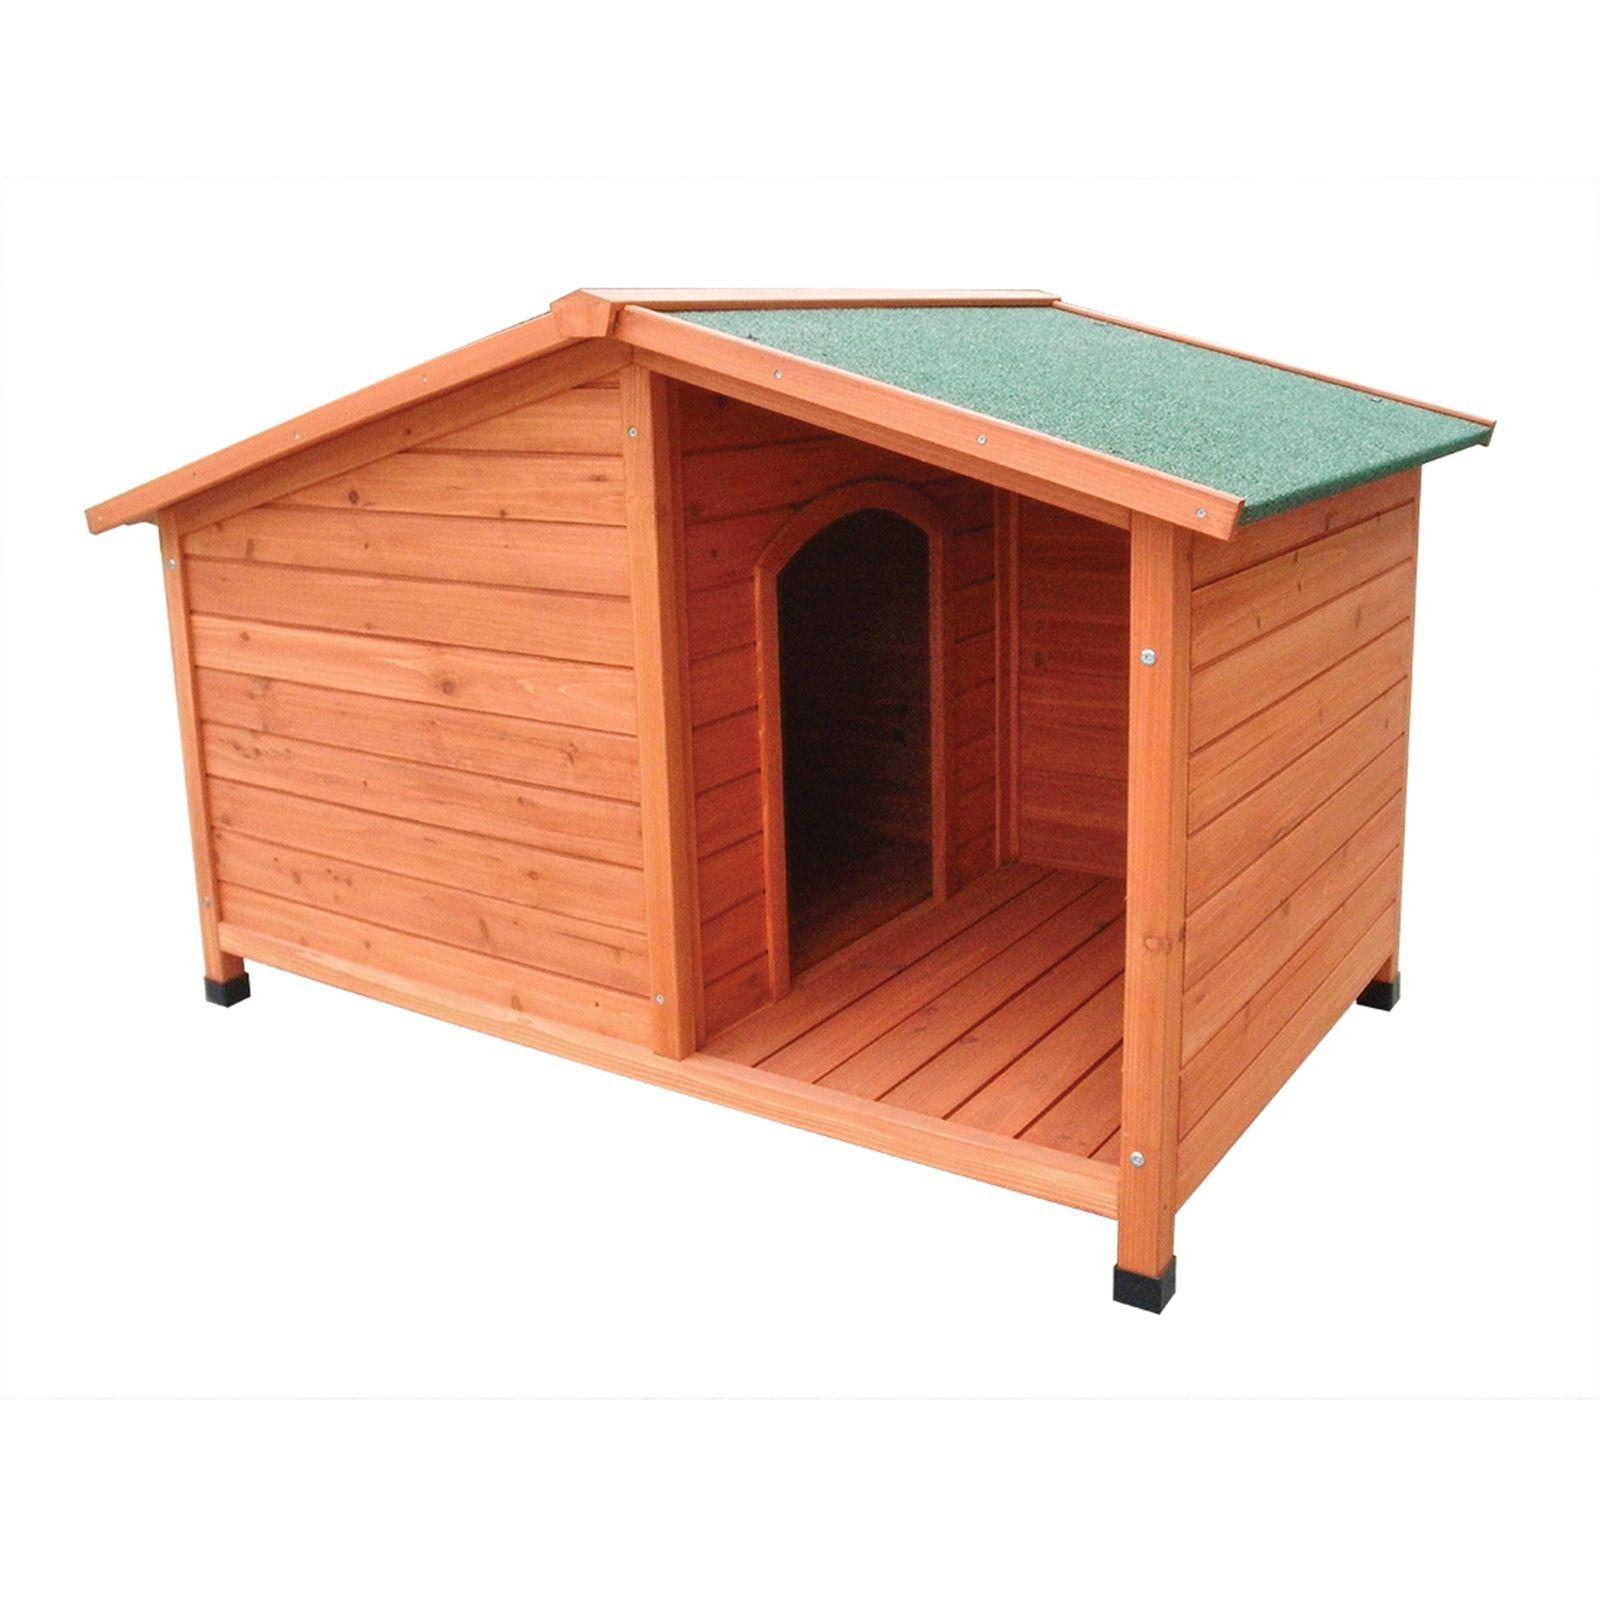 Pinnacle 1360 X 860 X 840mm Medium Villa Dog Kennel Medium Dog